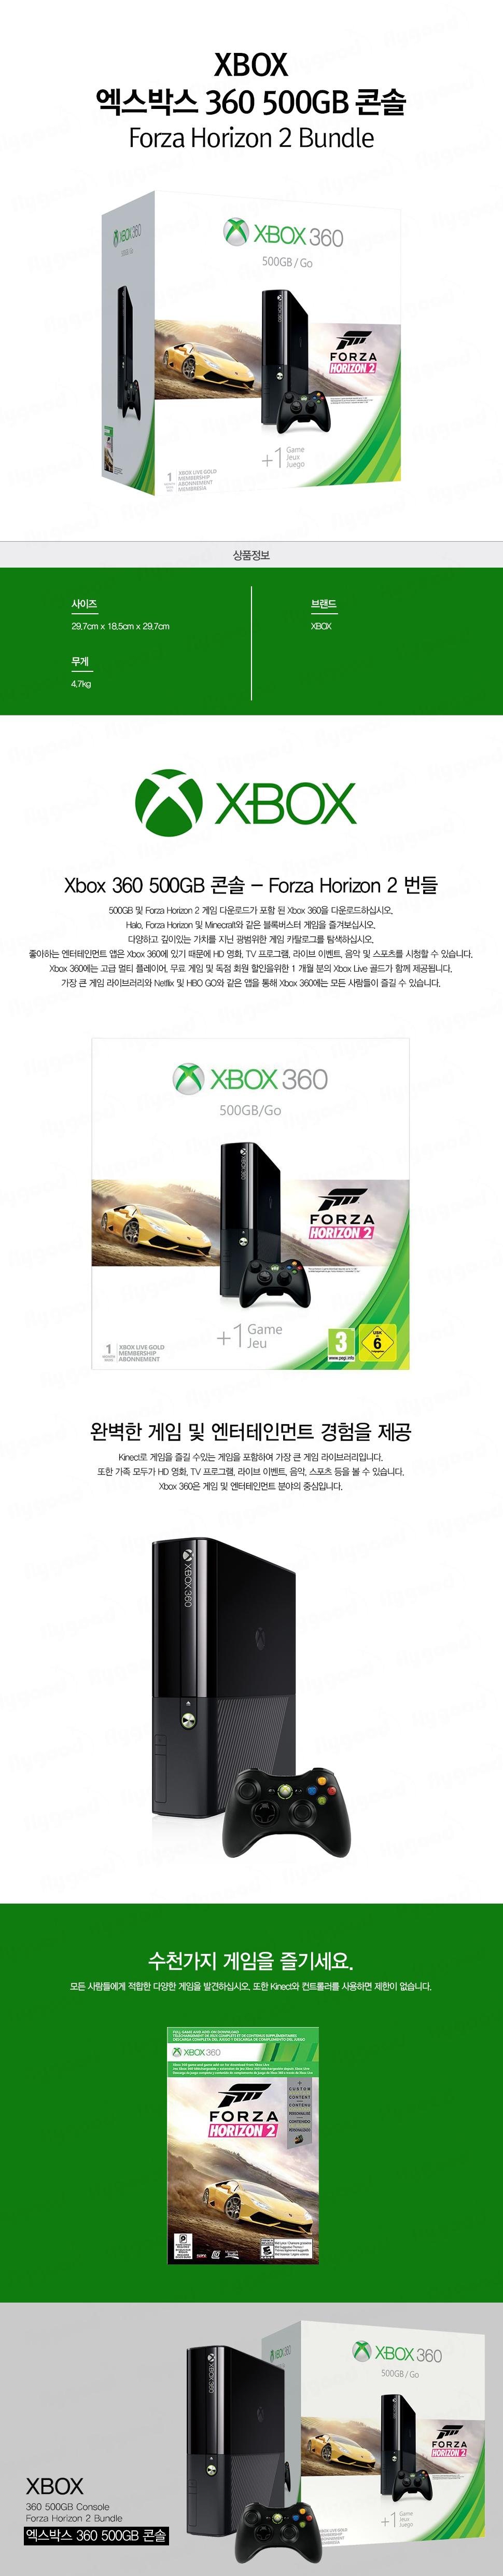 Xbox_360_500GB_콘솔.jpg